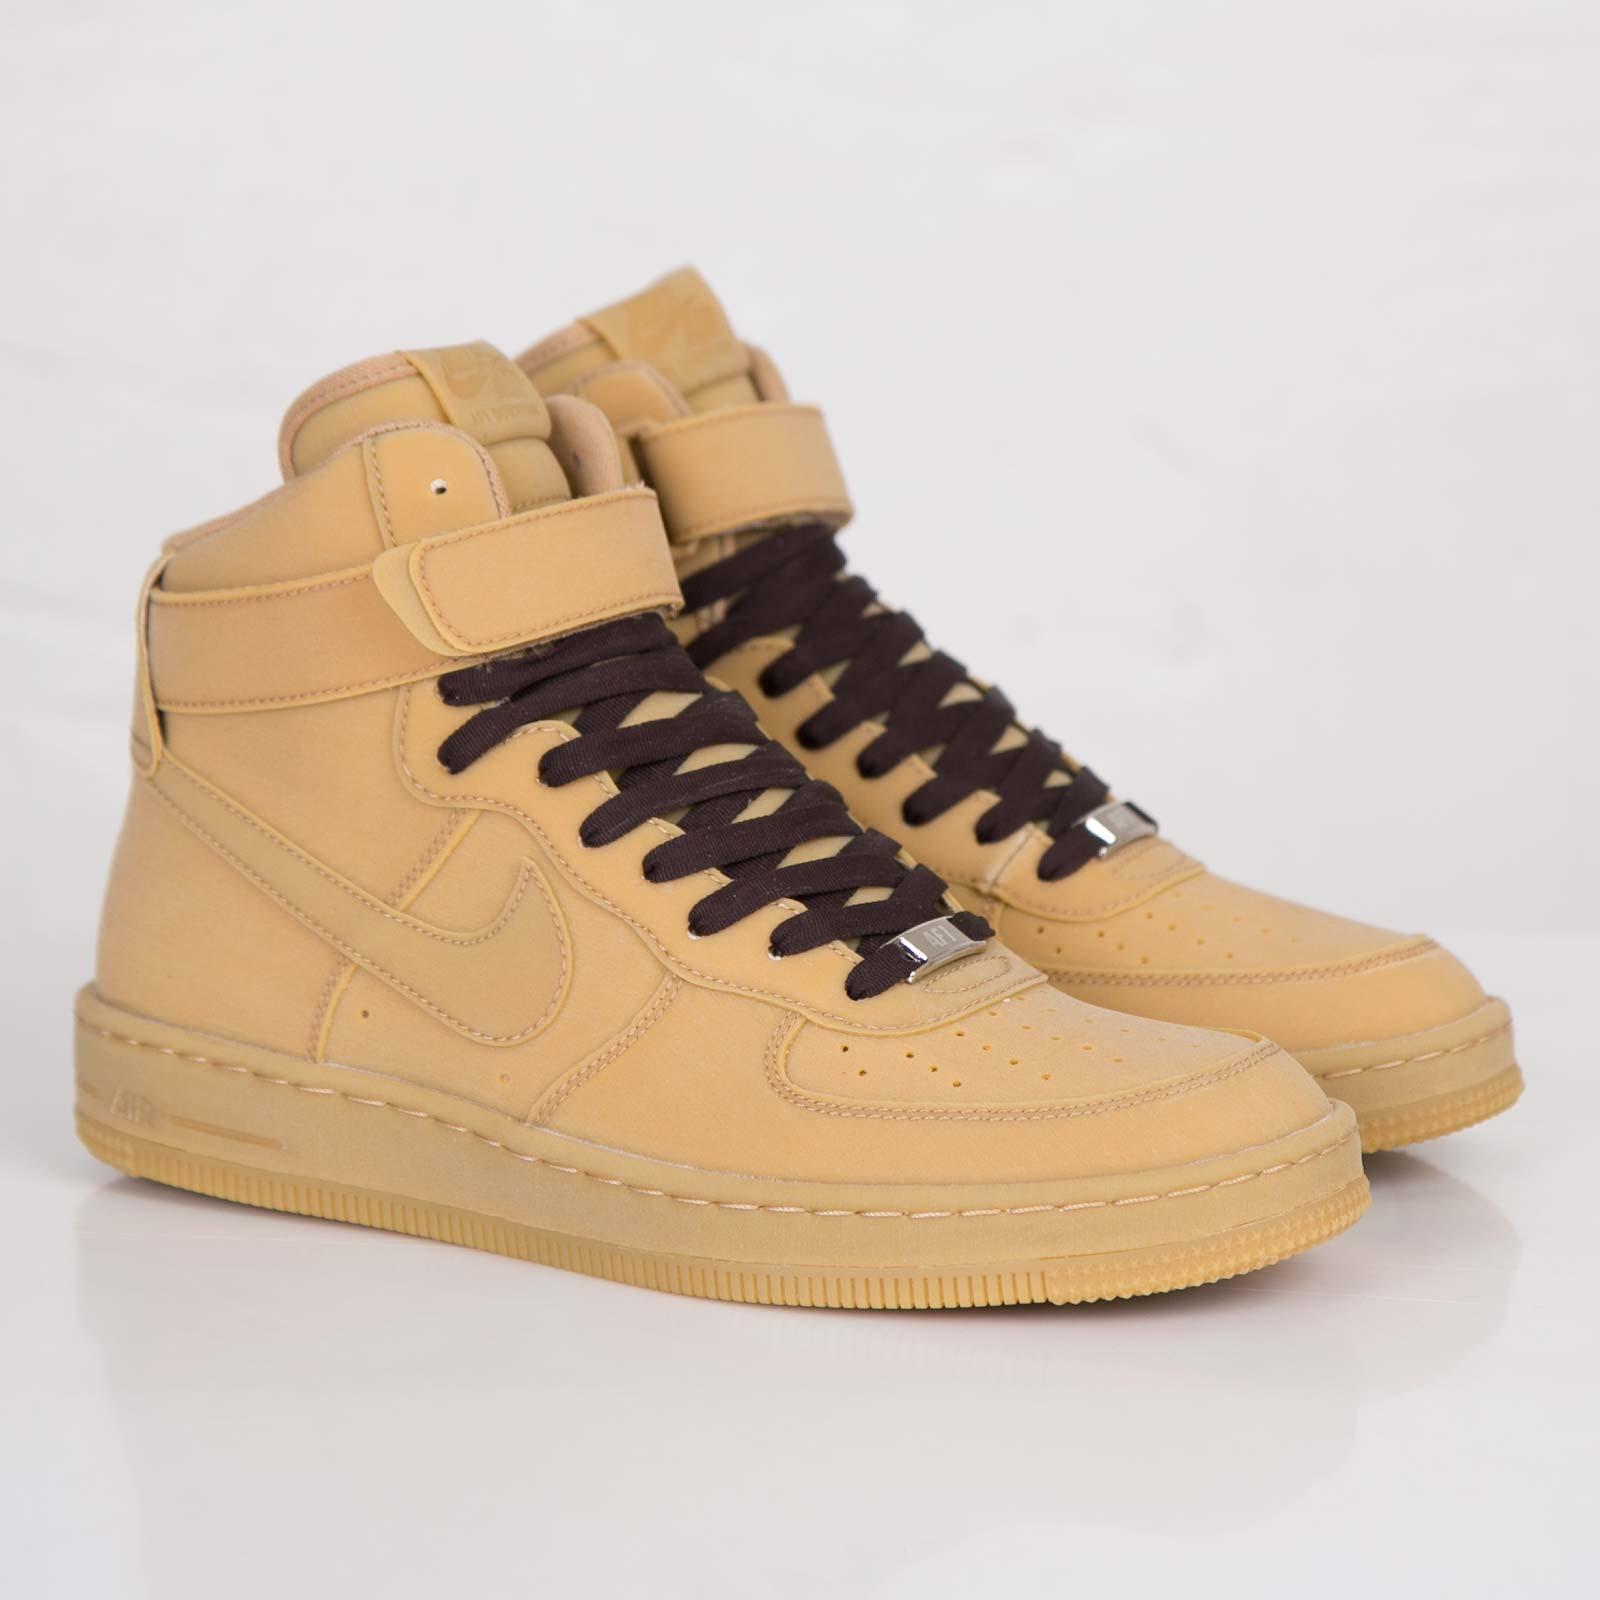 best website 72580 23f98 Nike Air Force 1 Downtown Hi Gum LW QS